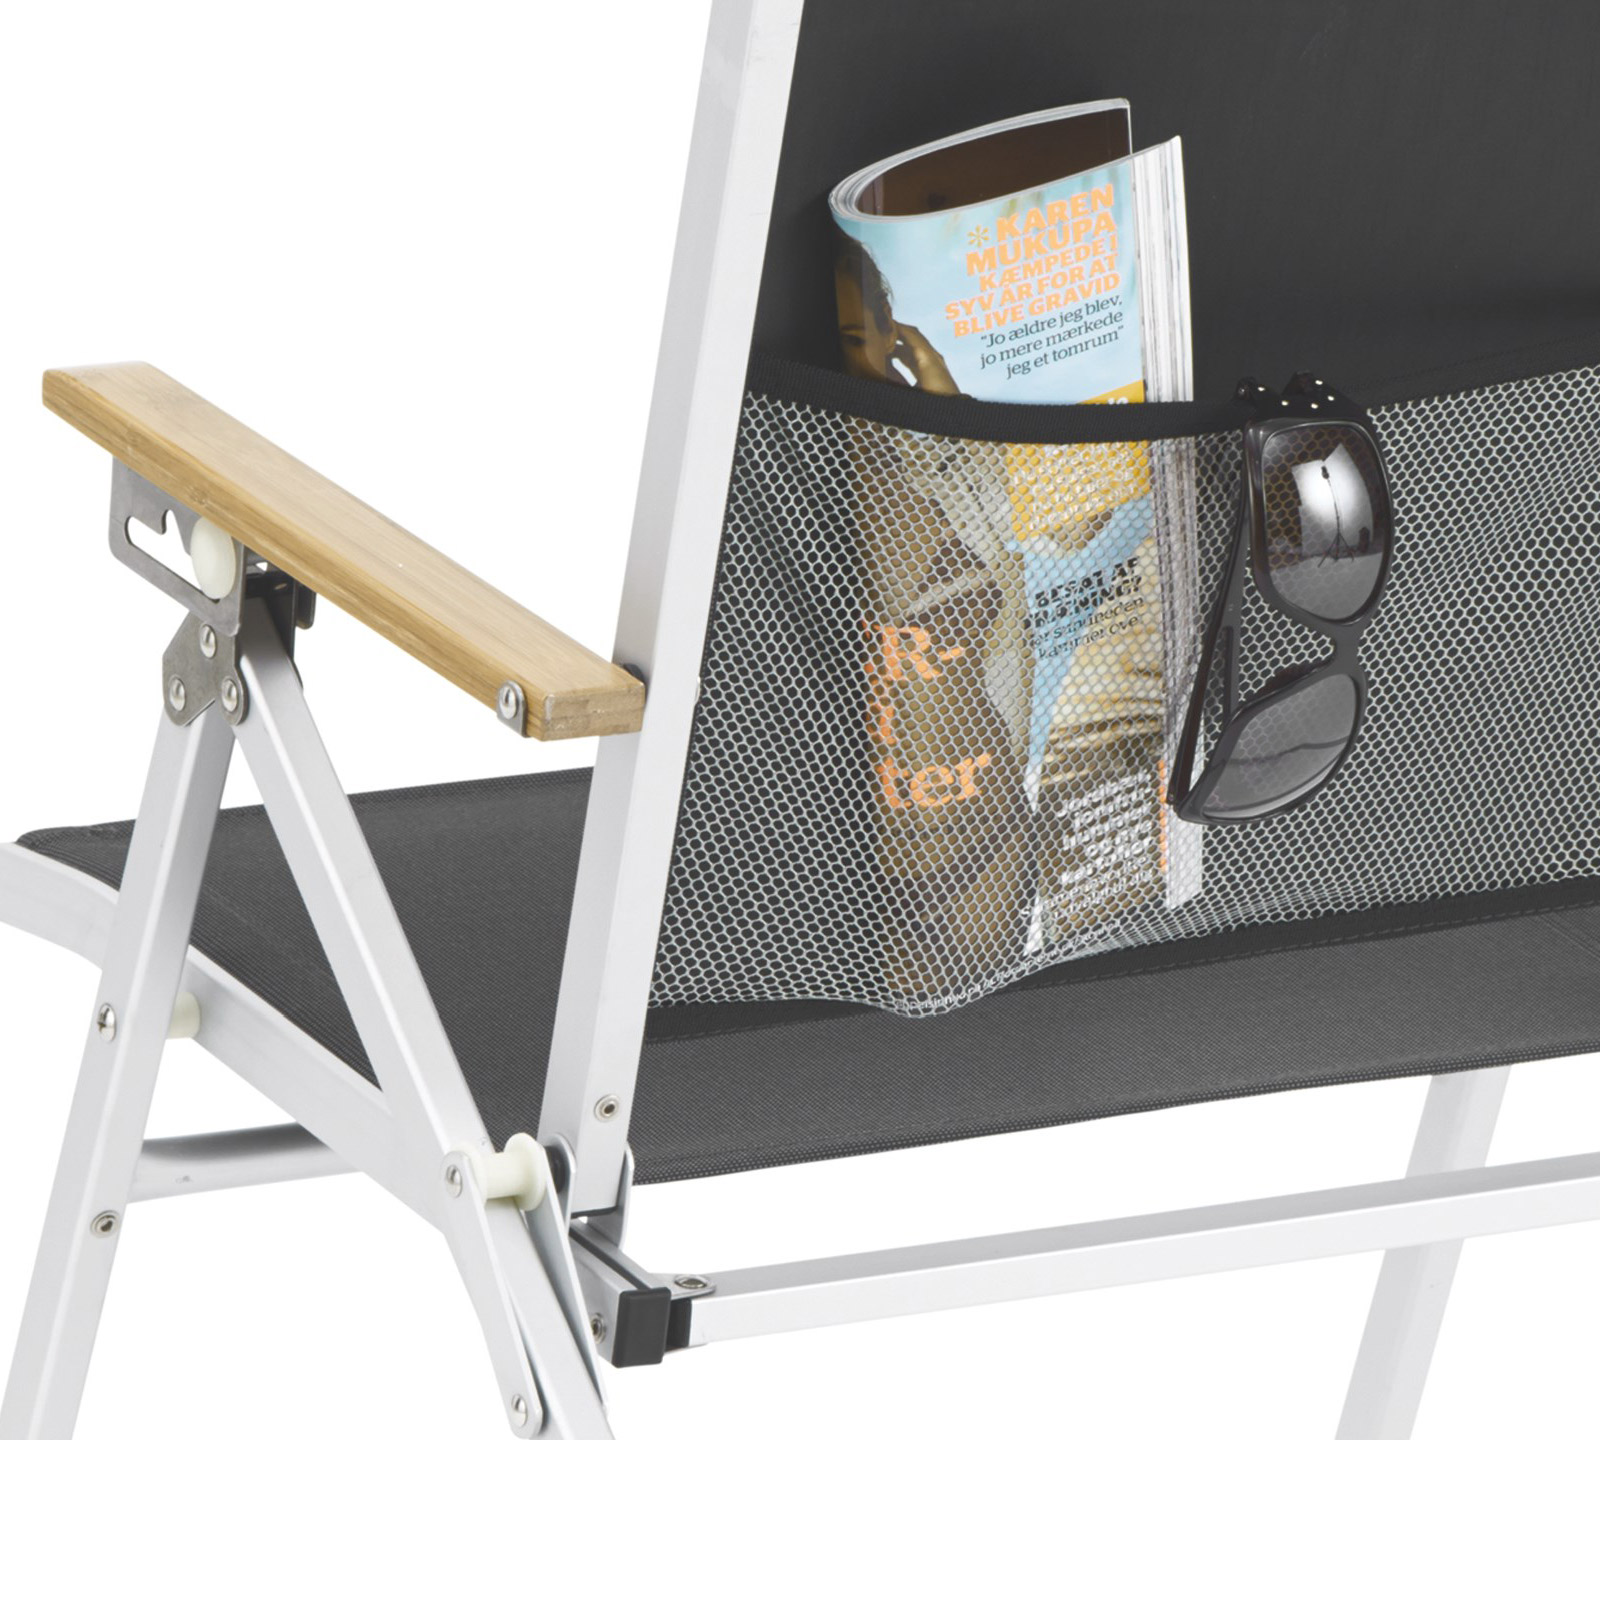 campingstuhl outwell plumas high back aluminium klappstuhl mit bambusarmlehnen ebay. Black Bedroom Furniture Sets. Home Design Ideas